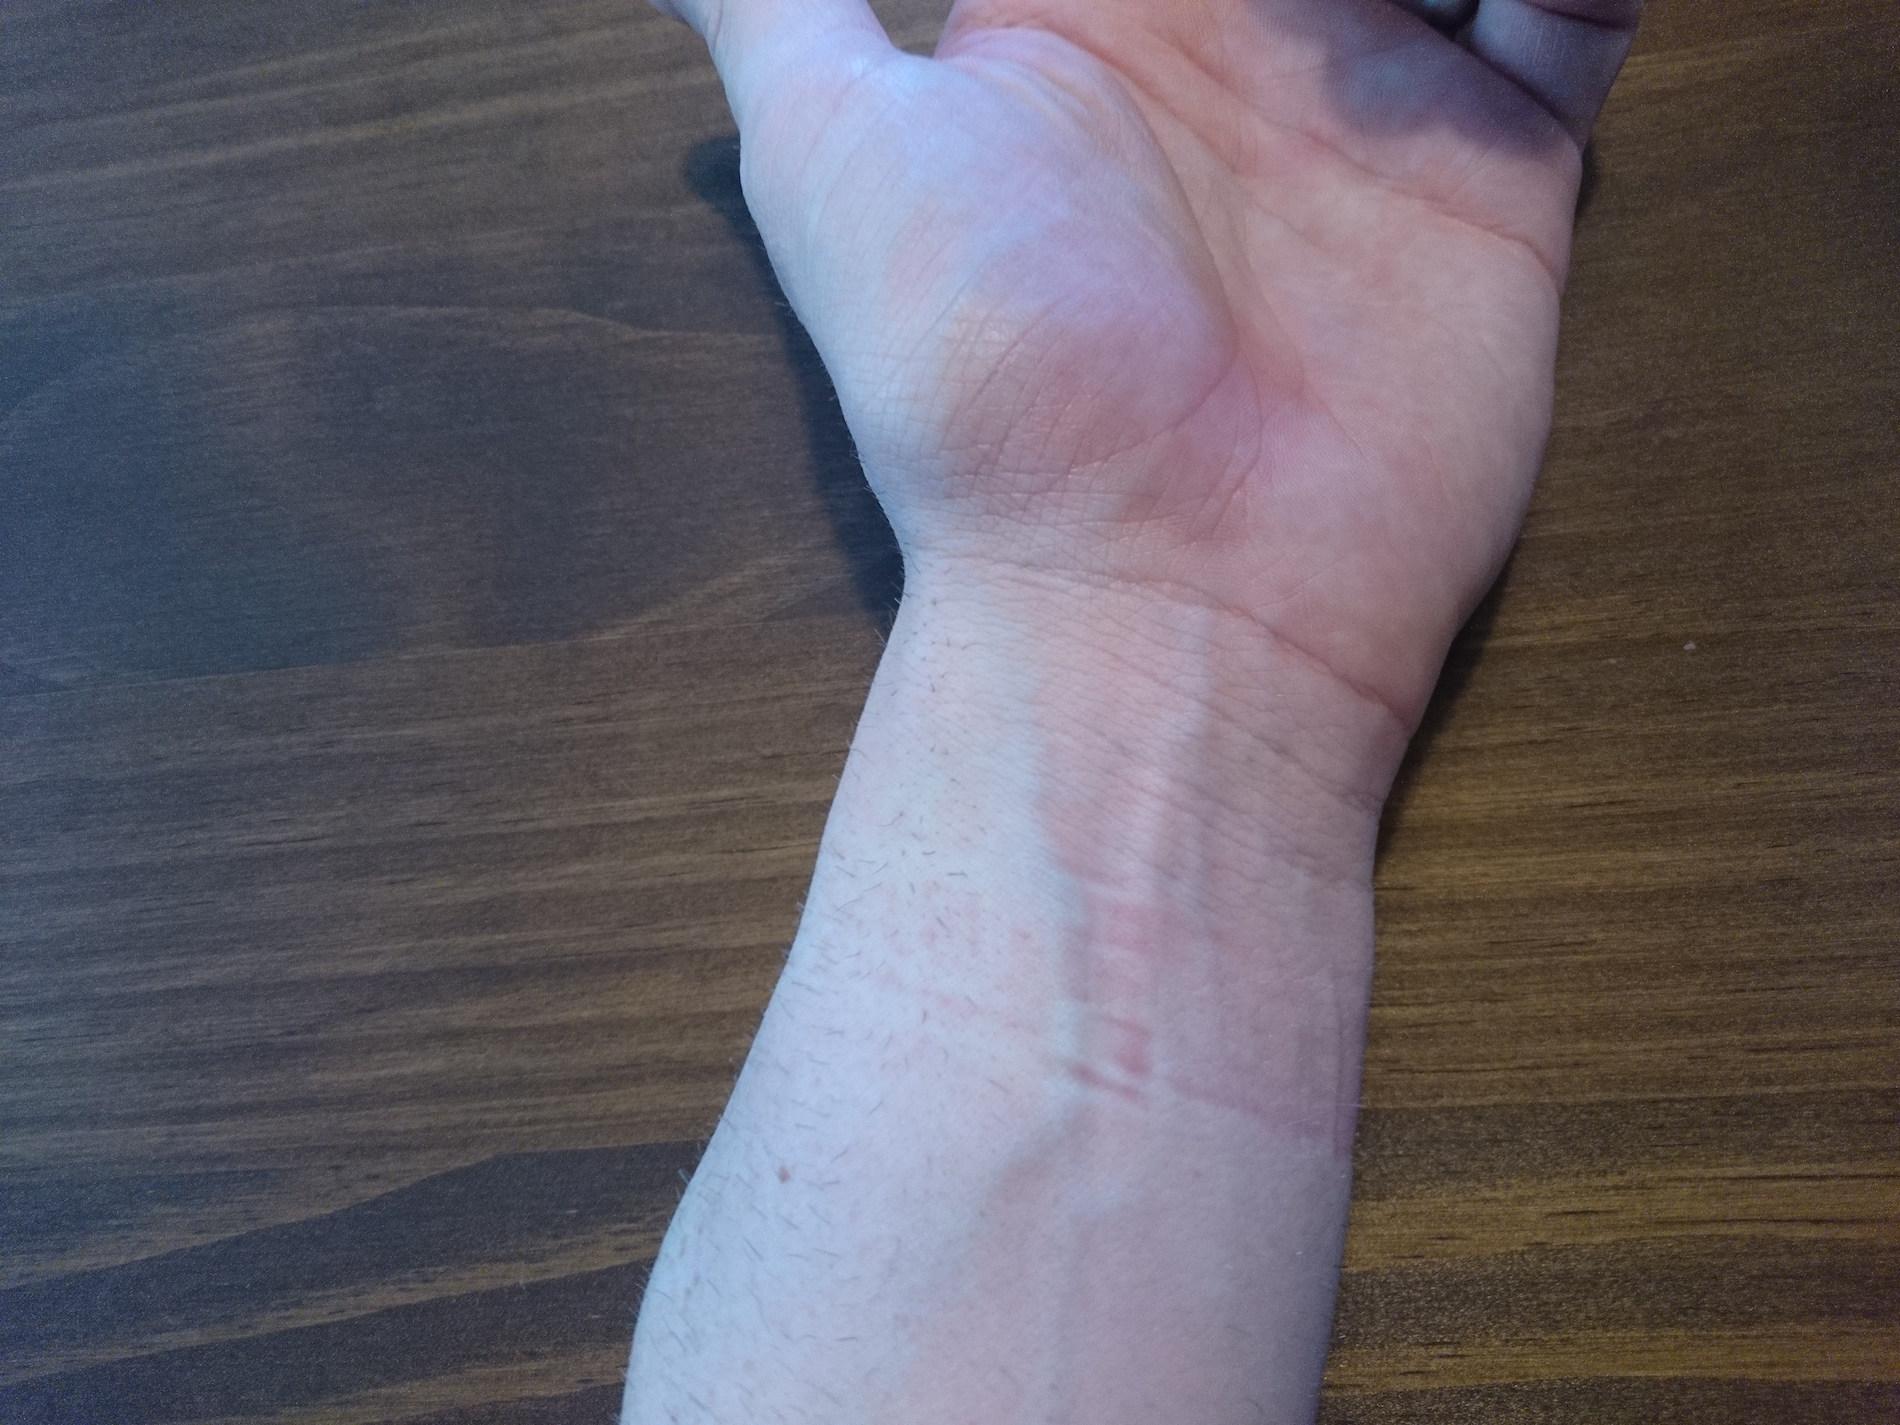 Garmin vivosmart HR Abdruck am Arm